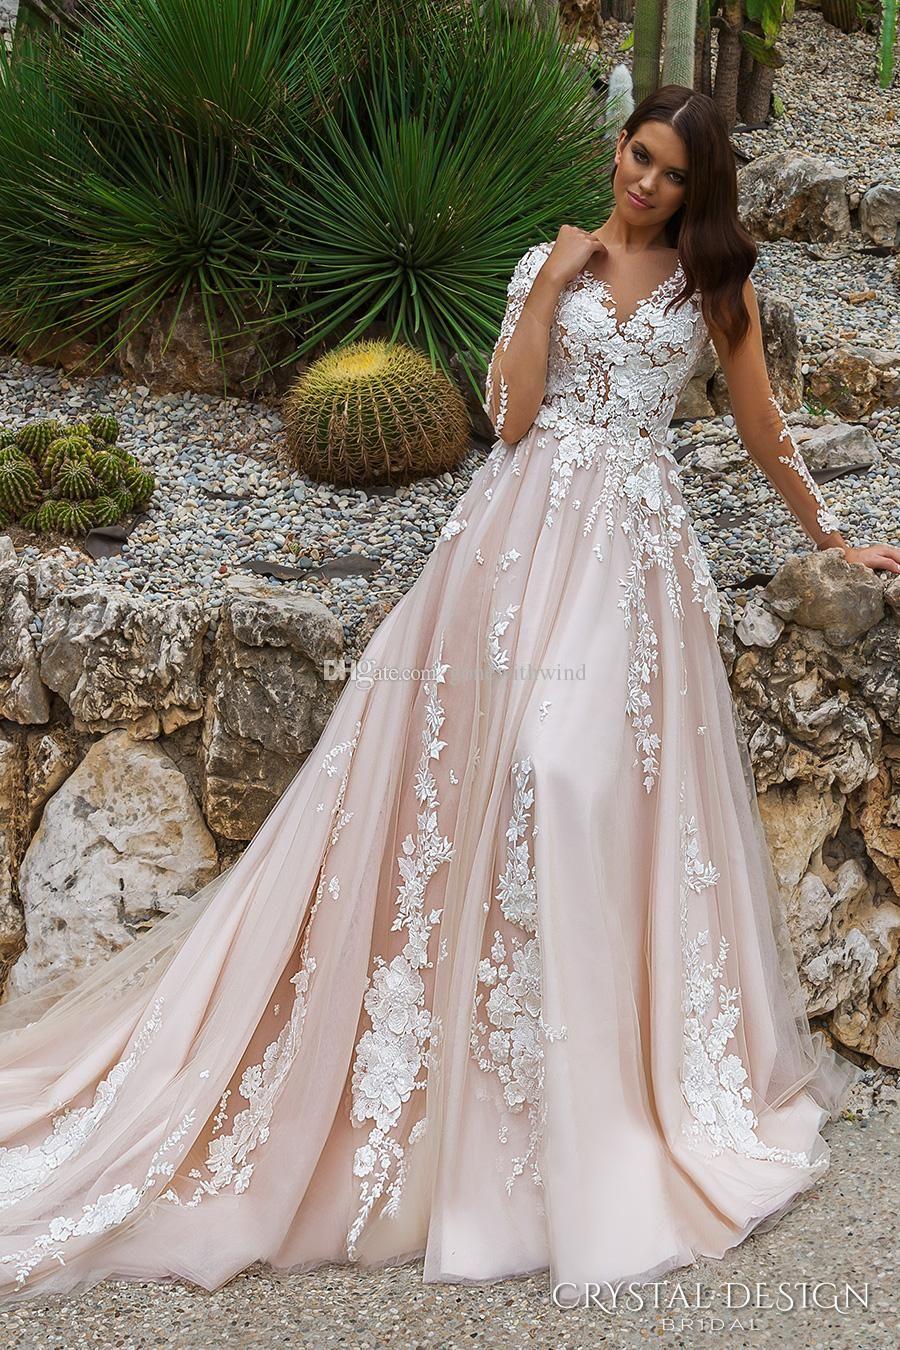 Blush long sleeved princes wedding dresses crystal design